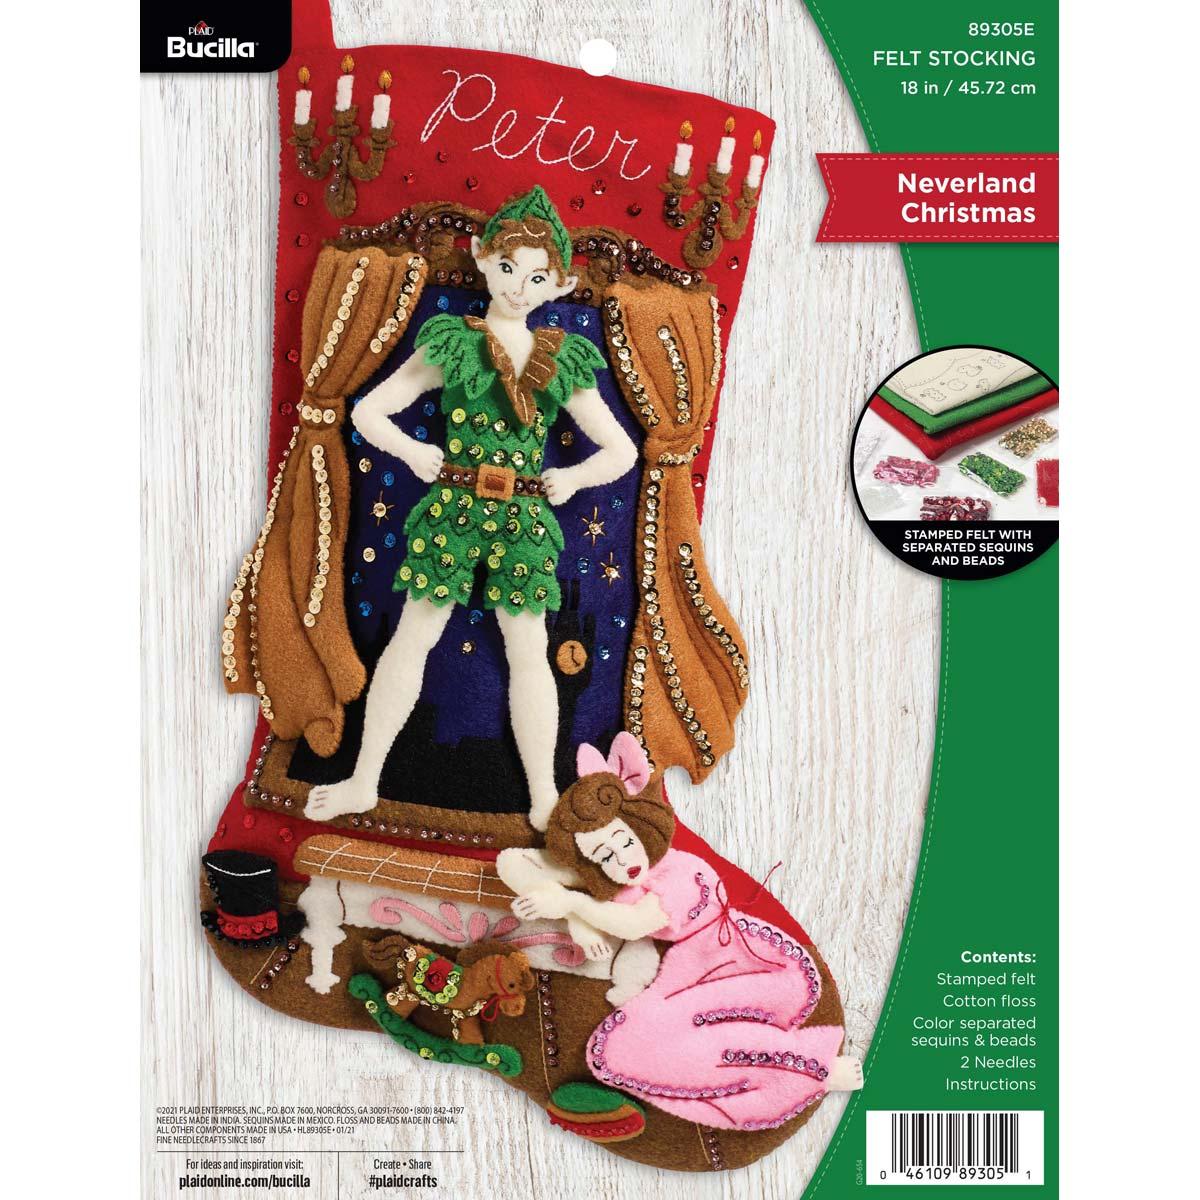 Bucilla ® Seasonal - Felt - Stocking Kits - Neverland Christmas - 89305E